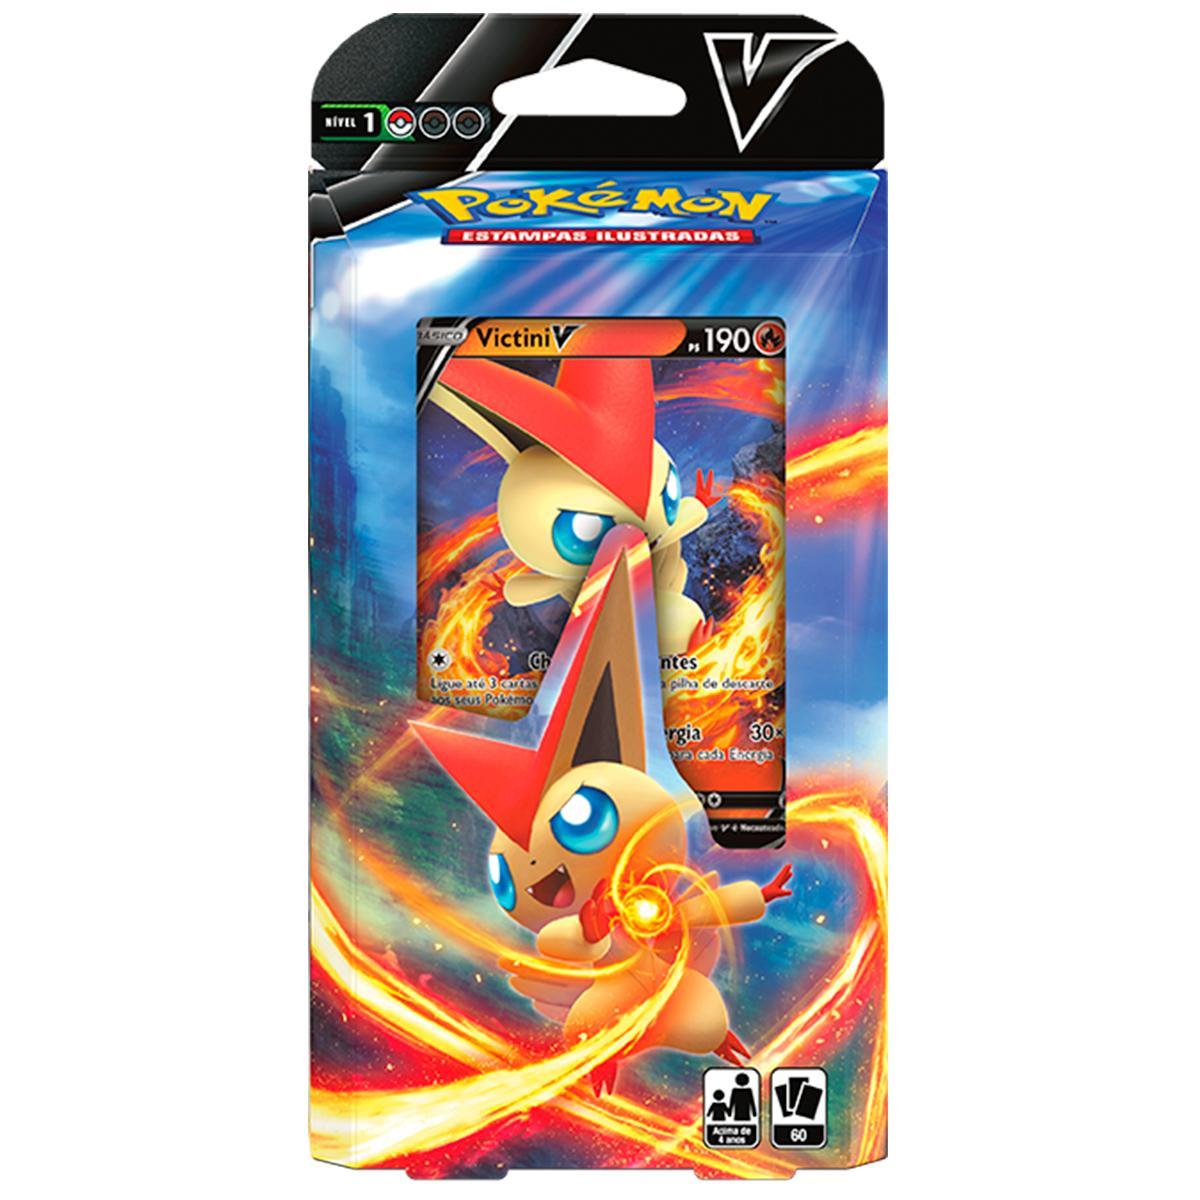 Baralho de Batalha V Deck Pokémon Victini V